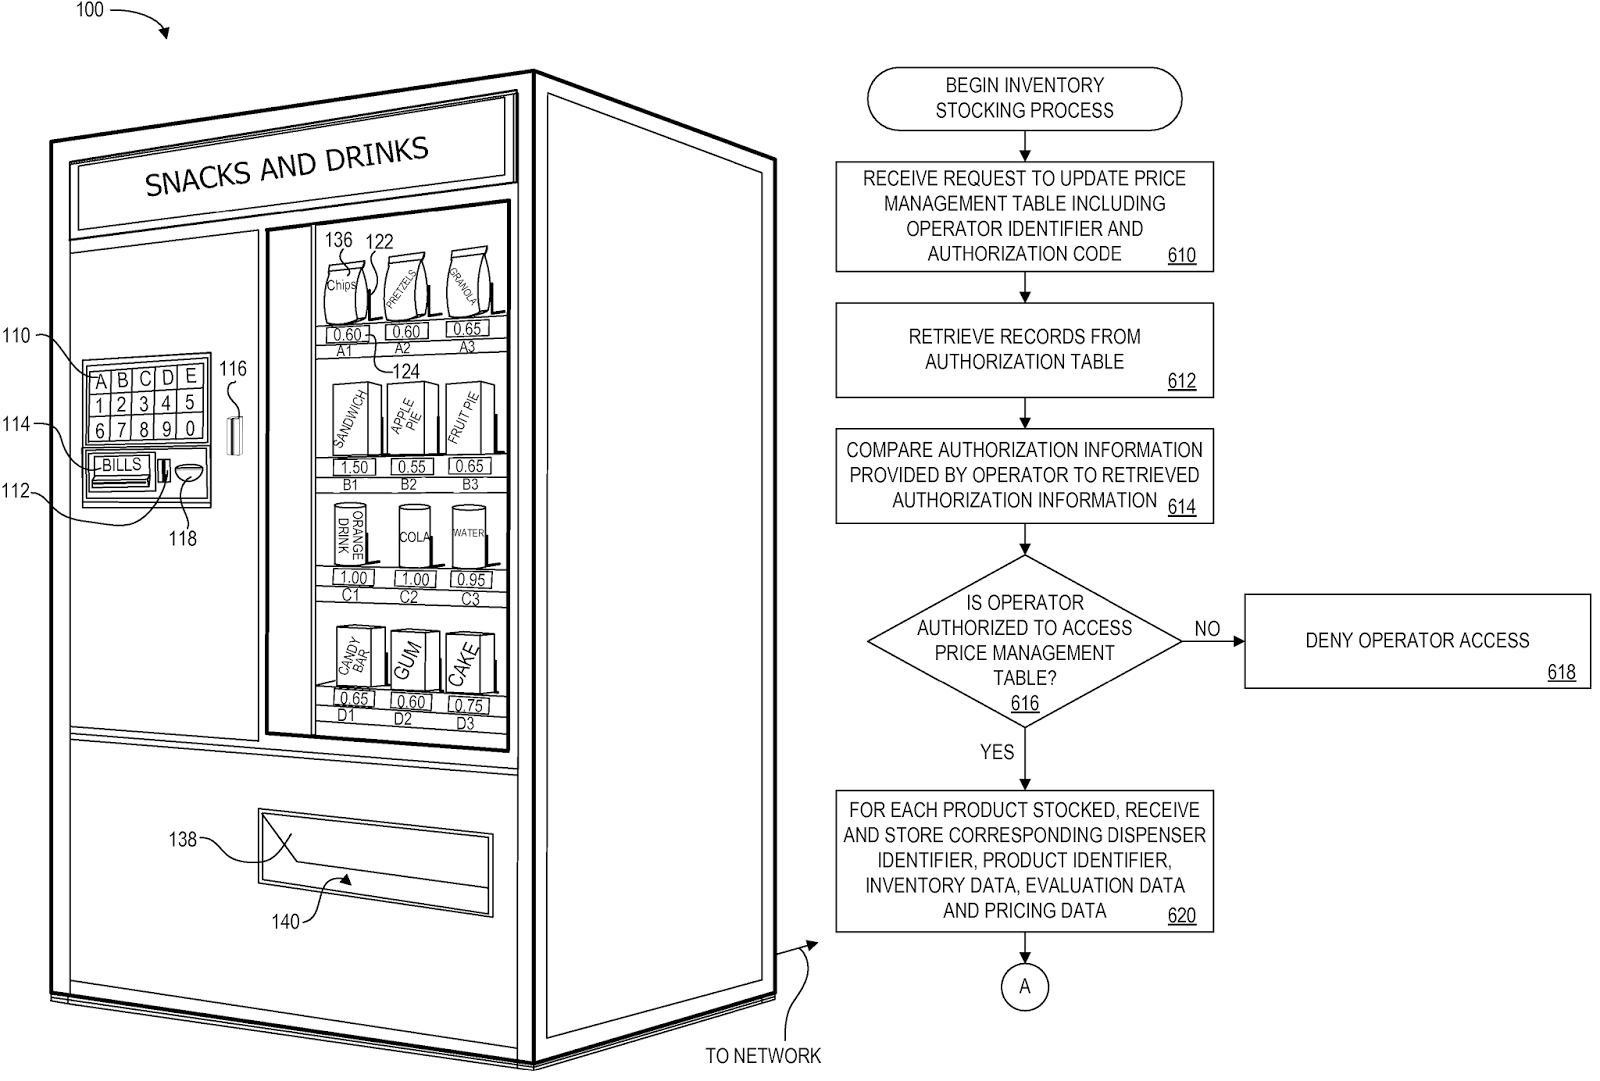 the chocolate vending machine